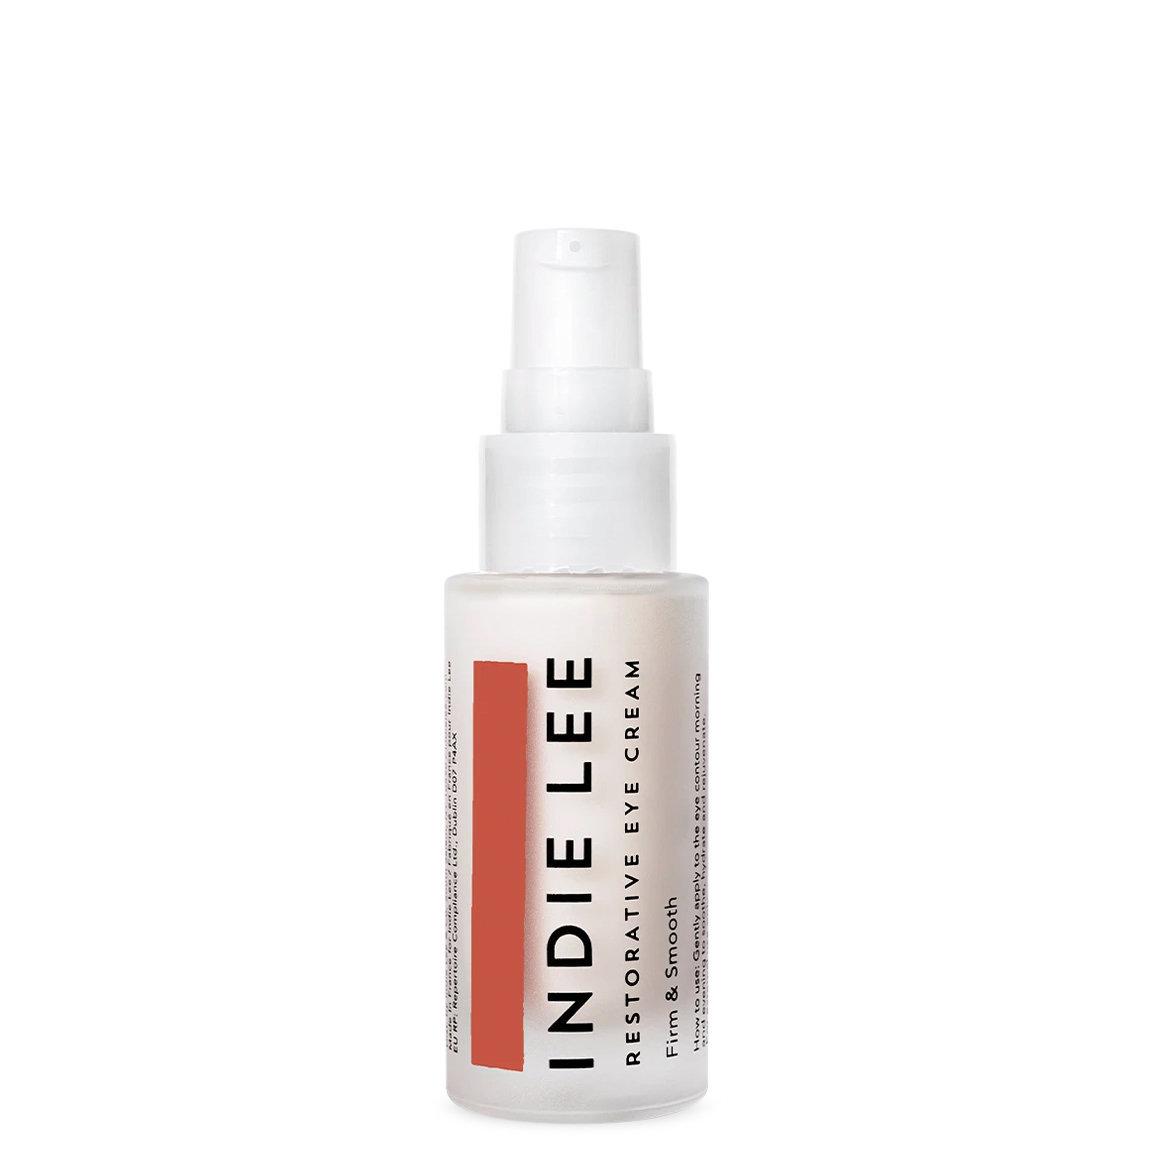 Indie Lee Restorative Eye Cream alternative view 1 - product swatch.